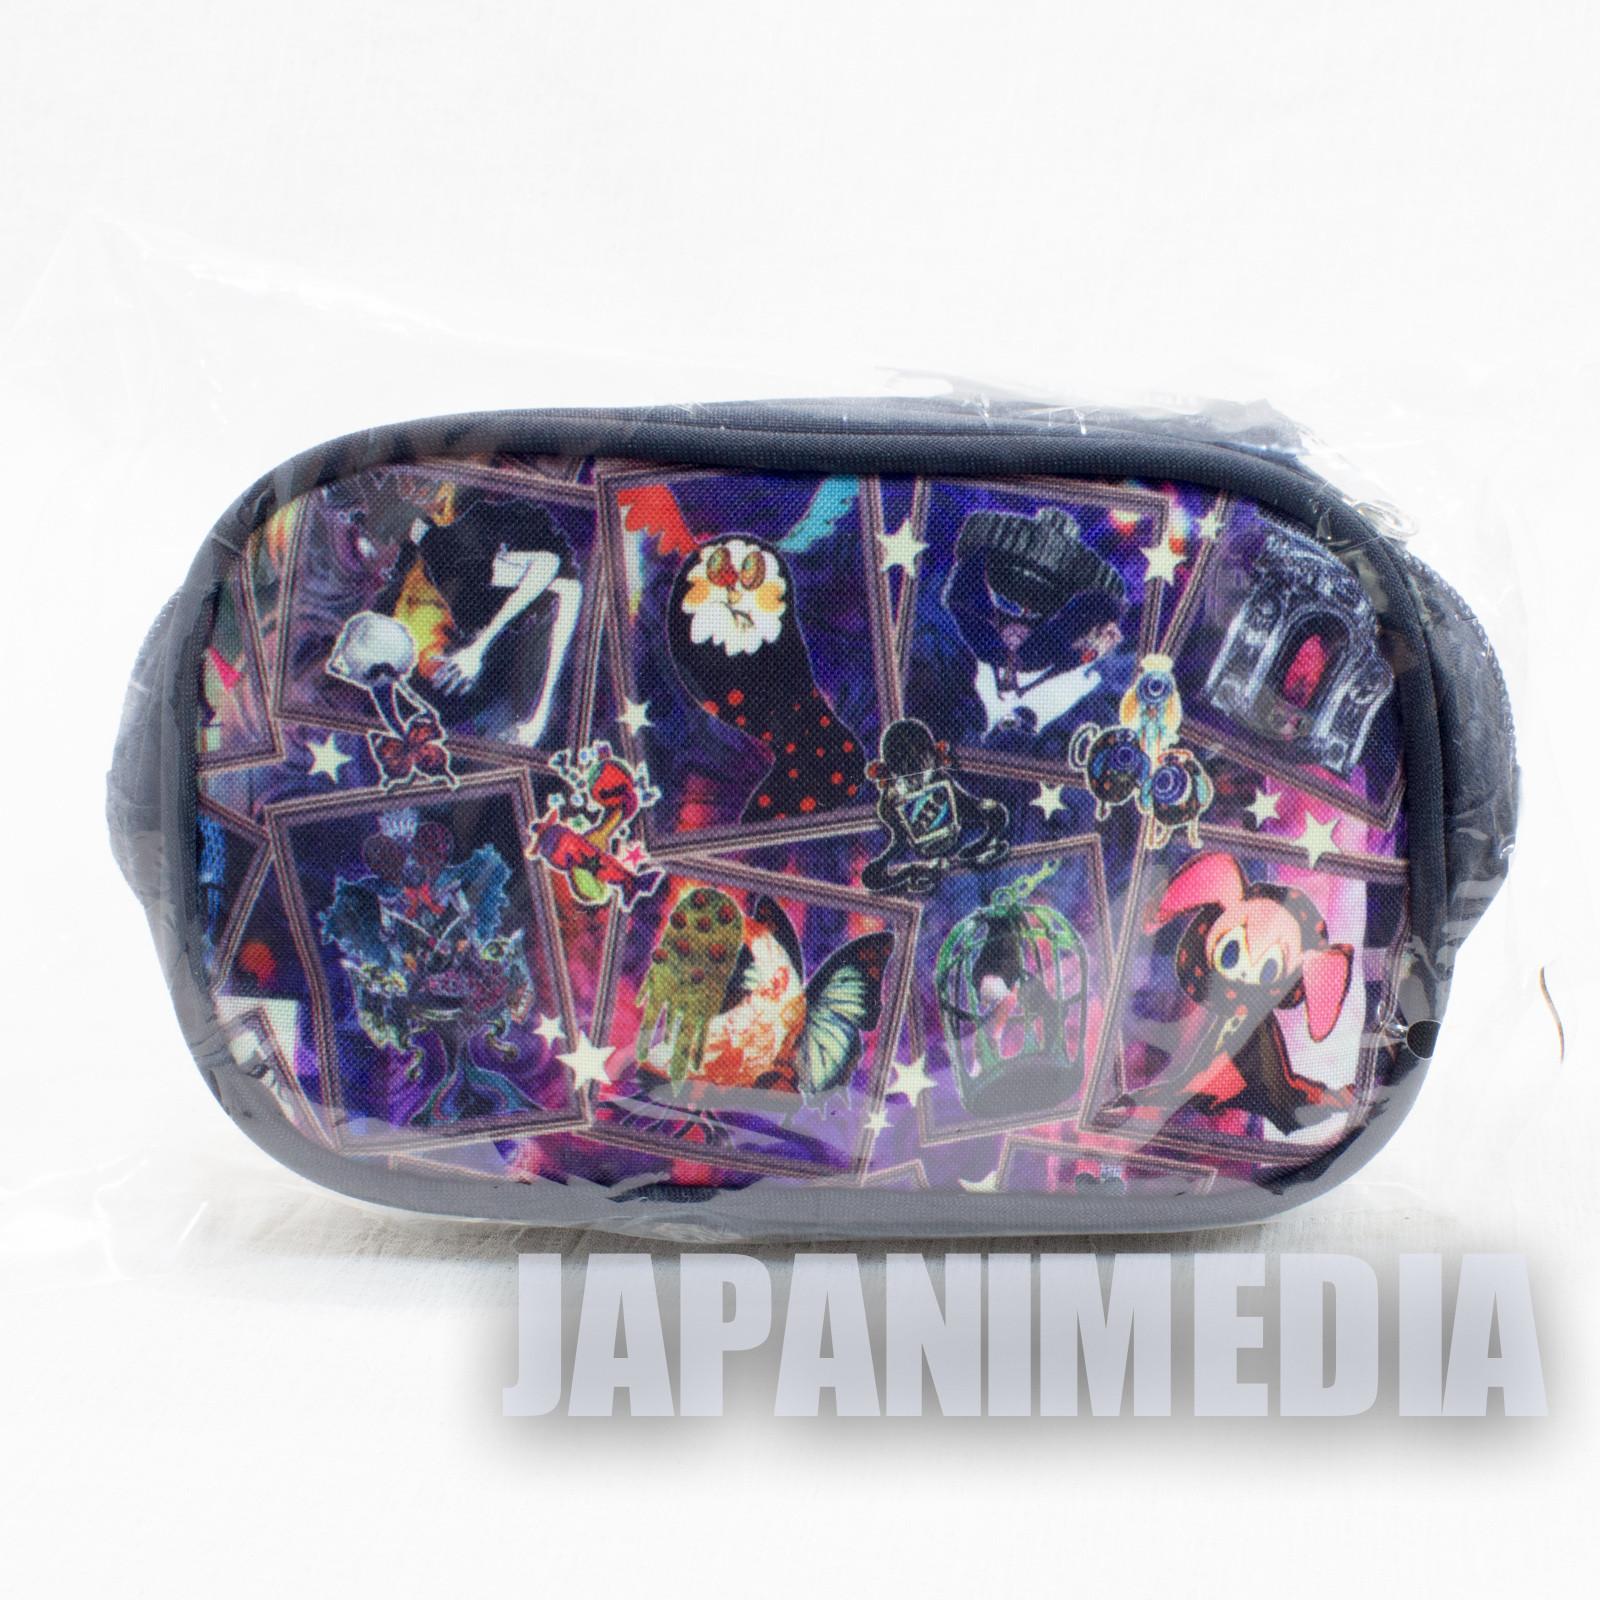 Puella Magi Madoka Magica Pouch Mini Bag Sweet Witch Ichiban Kuji JAPAN ANIME 2